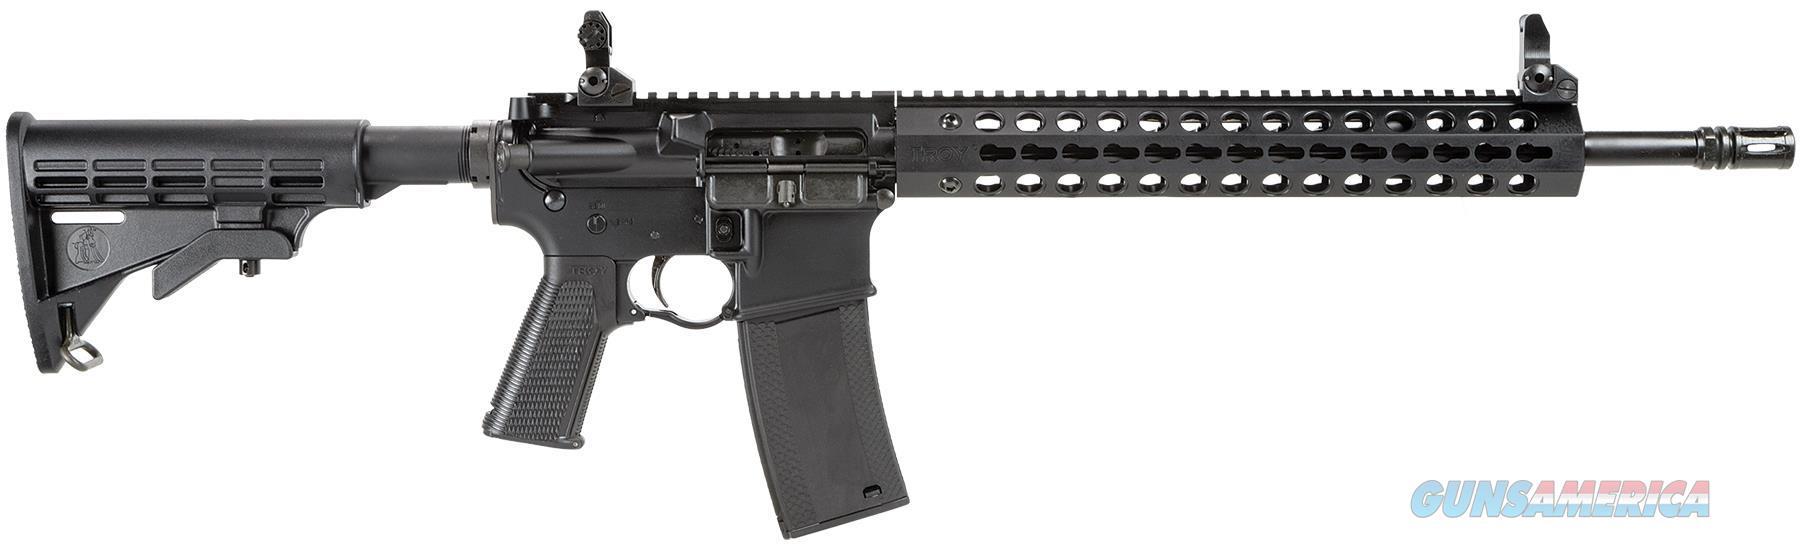 "Troy Scarsp316bt Special Purpose Carb A3 Sa 223/5.56 16"" 30+1 6-Pos Col Stk Blk SCAR-SP3-16BT-00  Guns > Rifles > TU Misc Rifles"